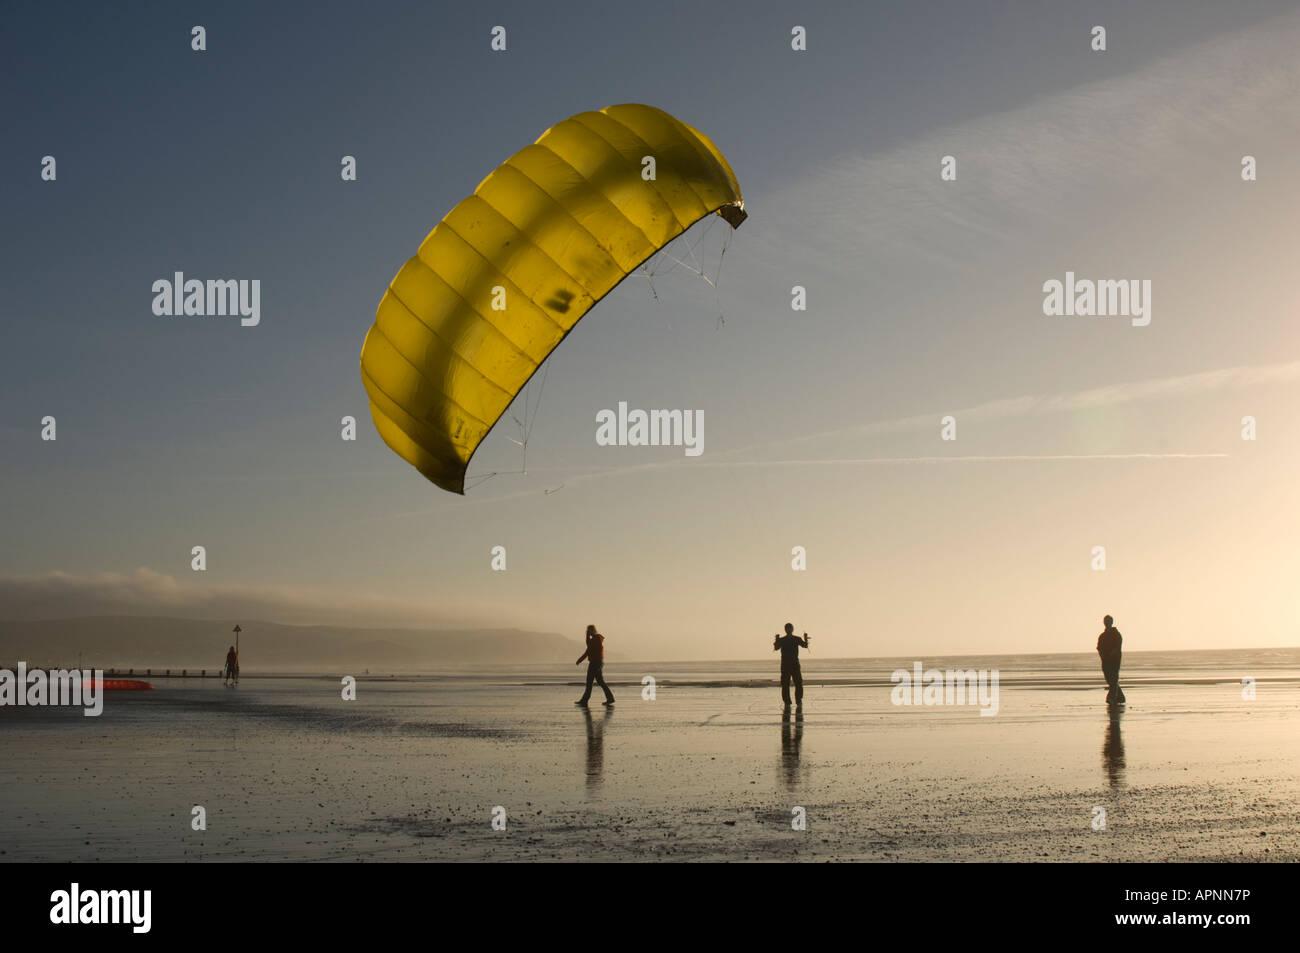 people Powerkite kite flying Ynyslas Borth beach west wales January late afternoon dusk sundown - Stock Image